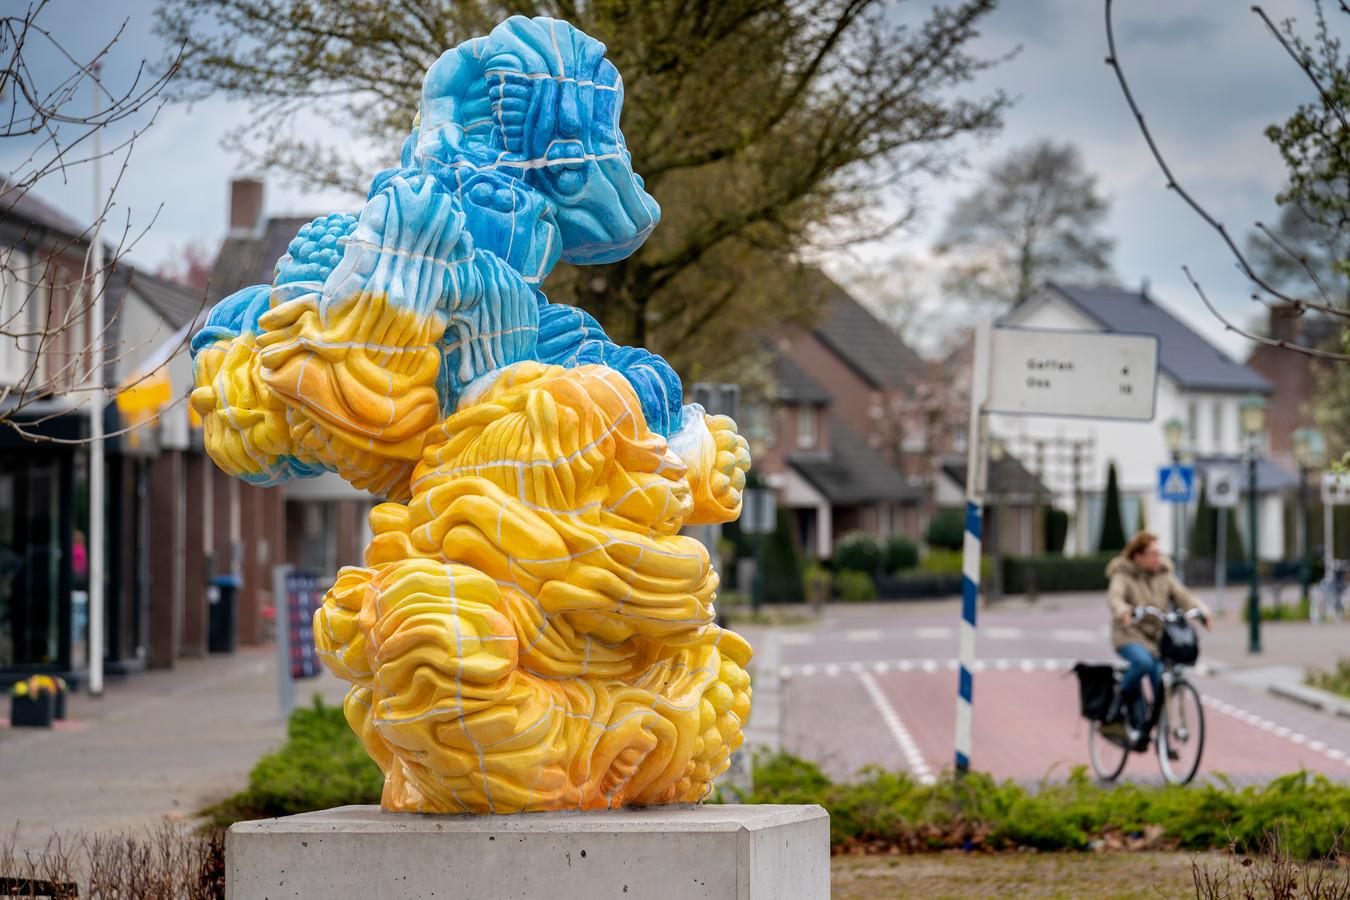 Nederland,  Nuland, het omstreden kunstwerk op de markt.